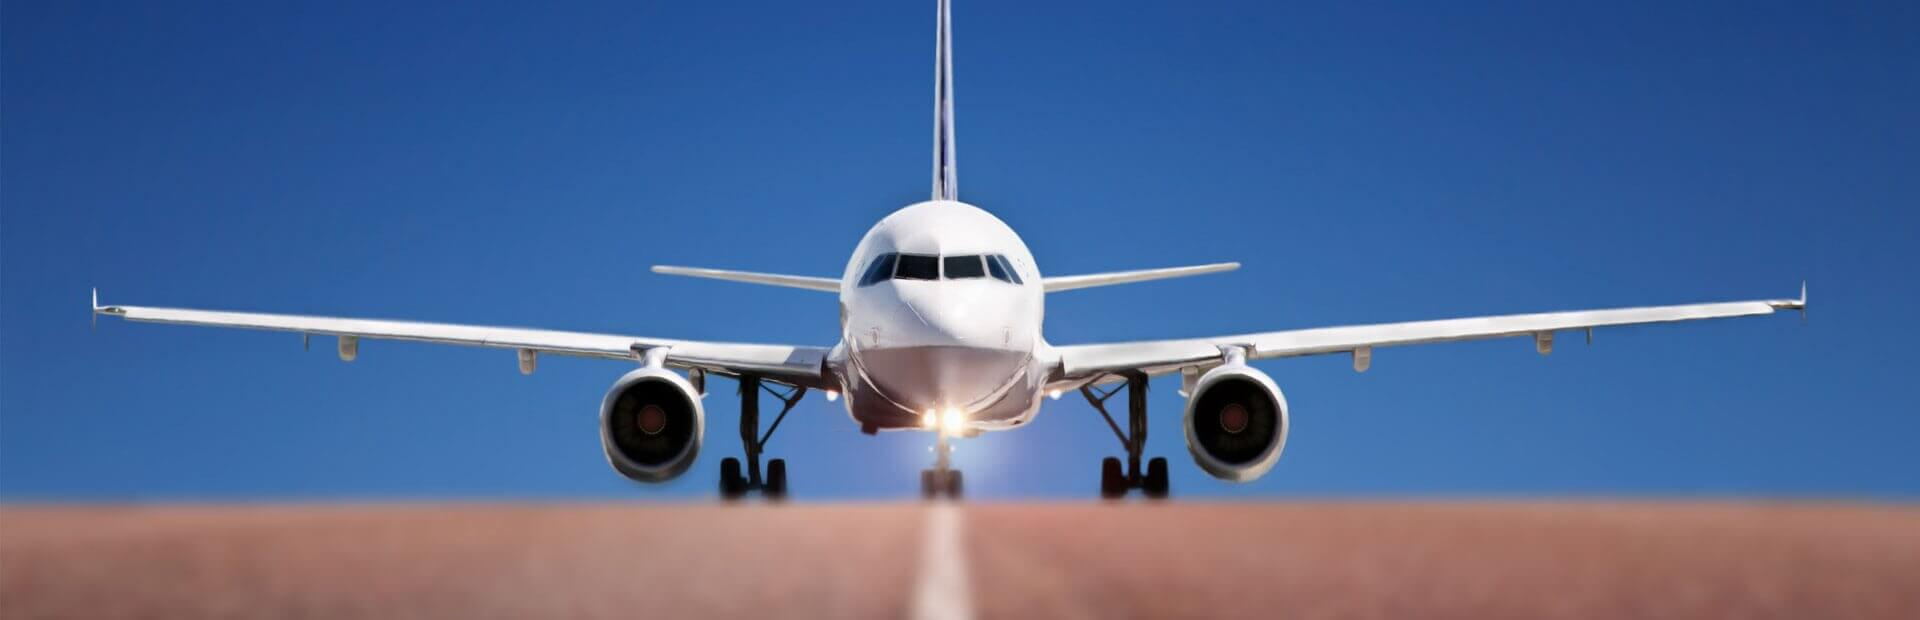 manchester-airport-plane-banner